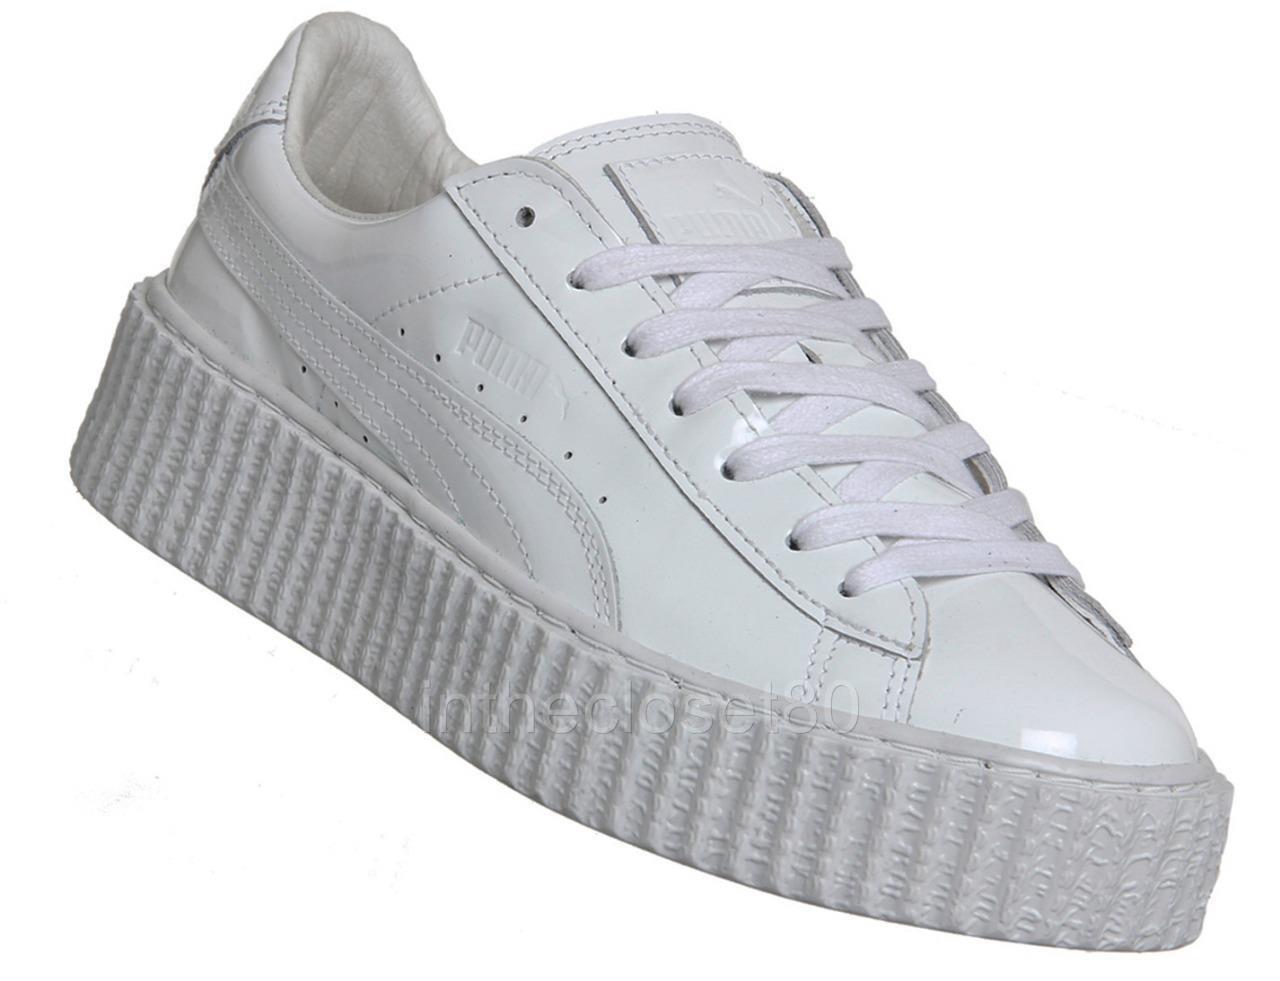 Puma Creepers Rihanna fenty Cesto Glow Scarpe bianco da ginnastica da donna bianco Scarpe 362269 01 1dee59